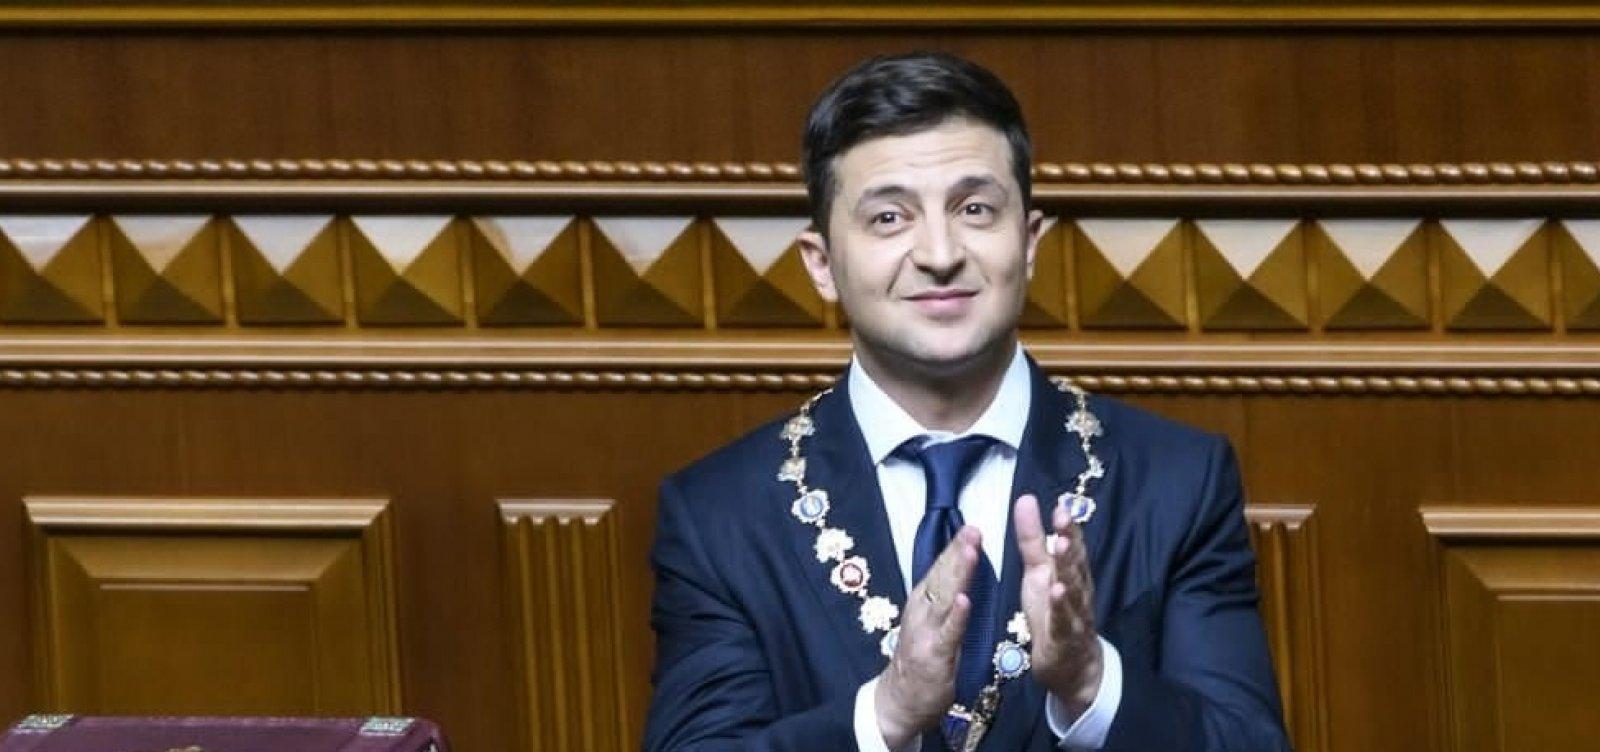 Presidente ucraniano dissolve Parlamento durante posse